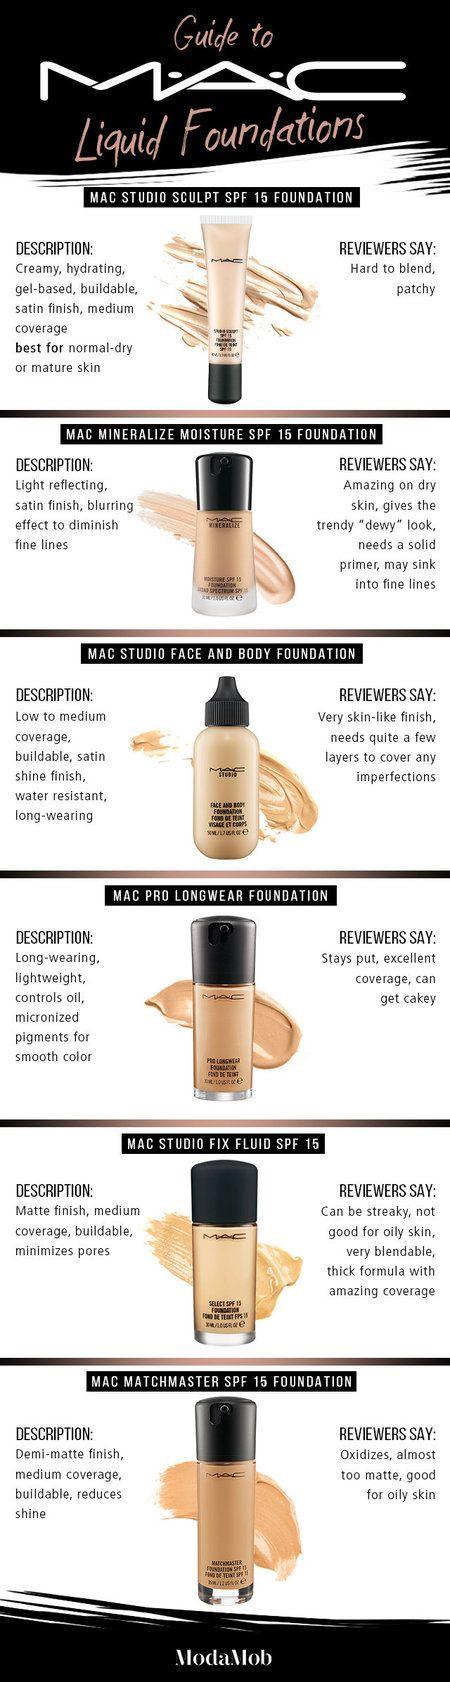 Guide to MAC Liquid Foundations -#mac #foundations #makeuptips #makeupreview